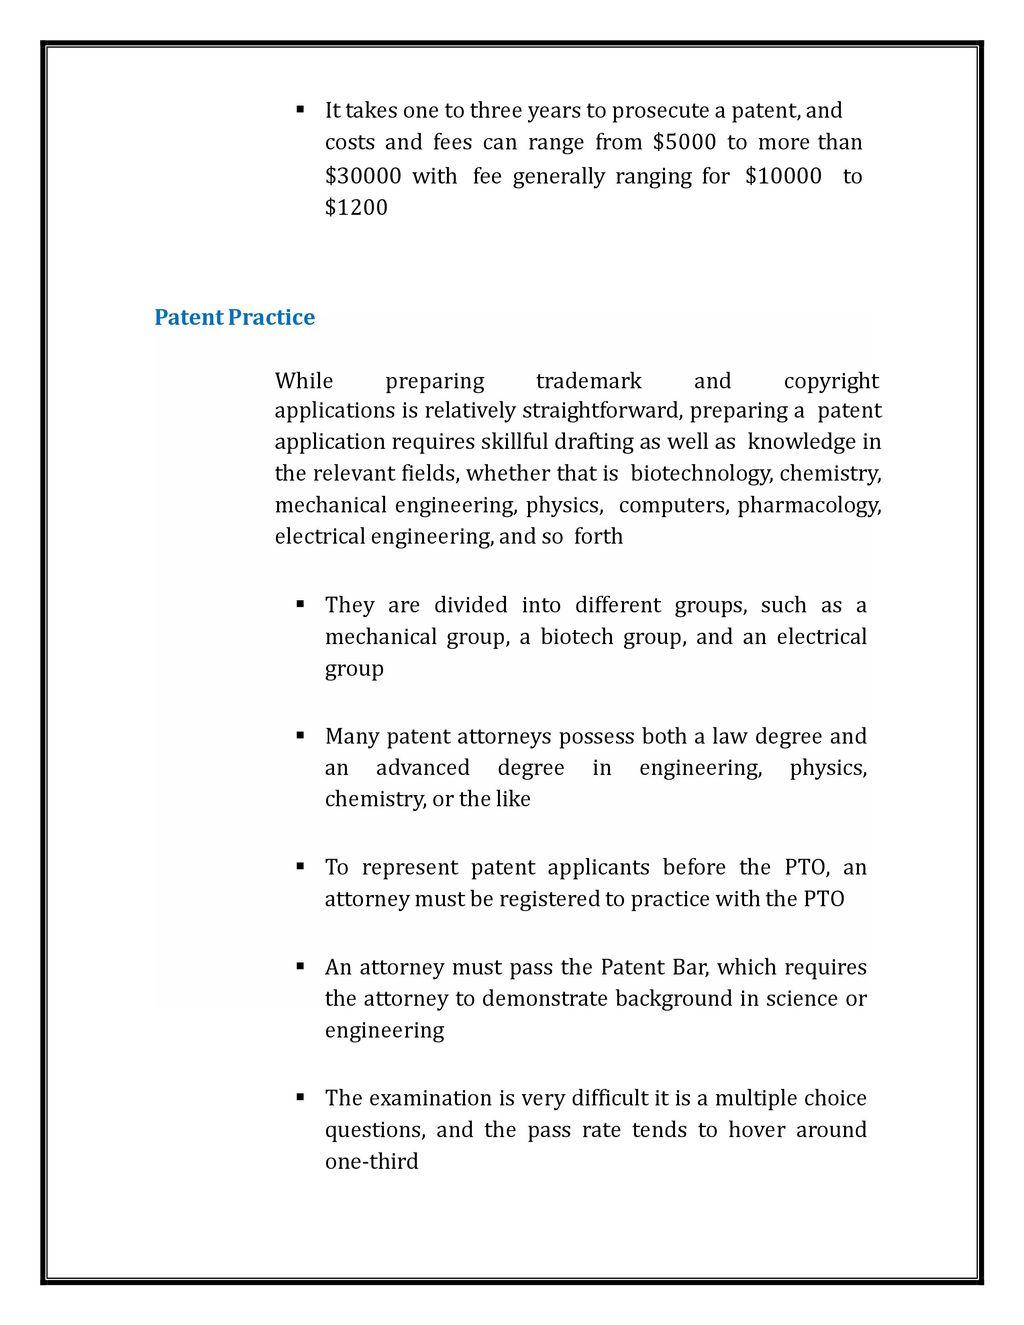 human computer interaction essay job salary